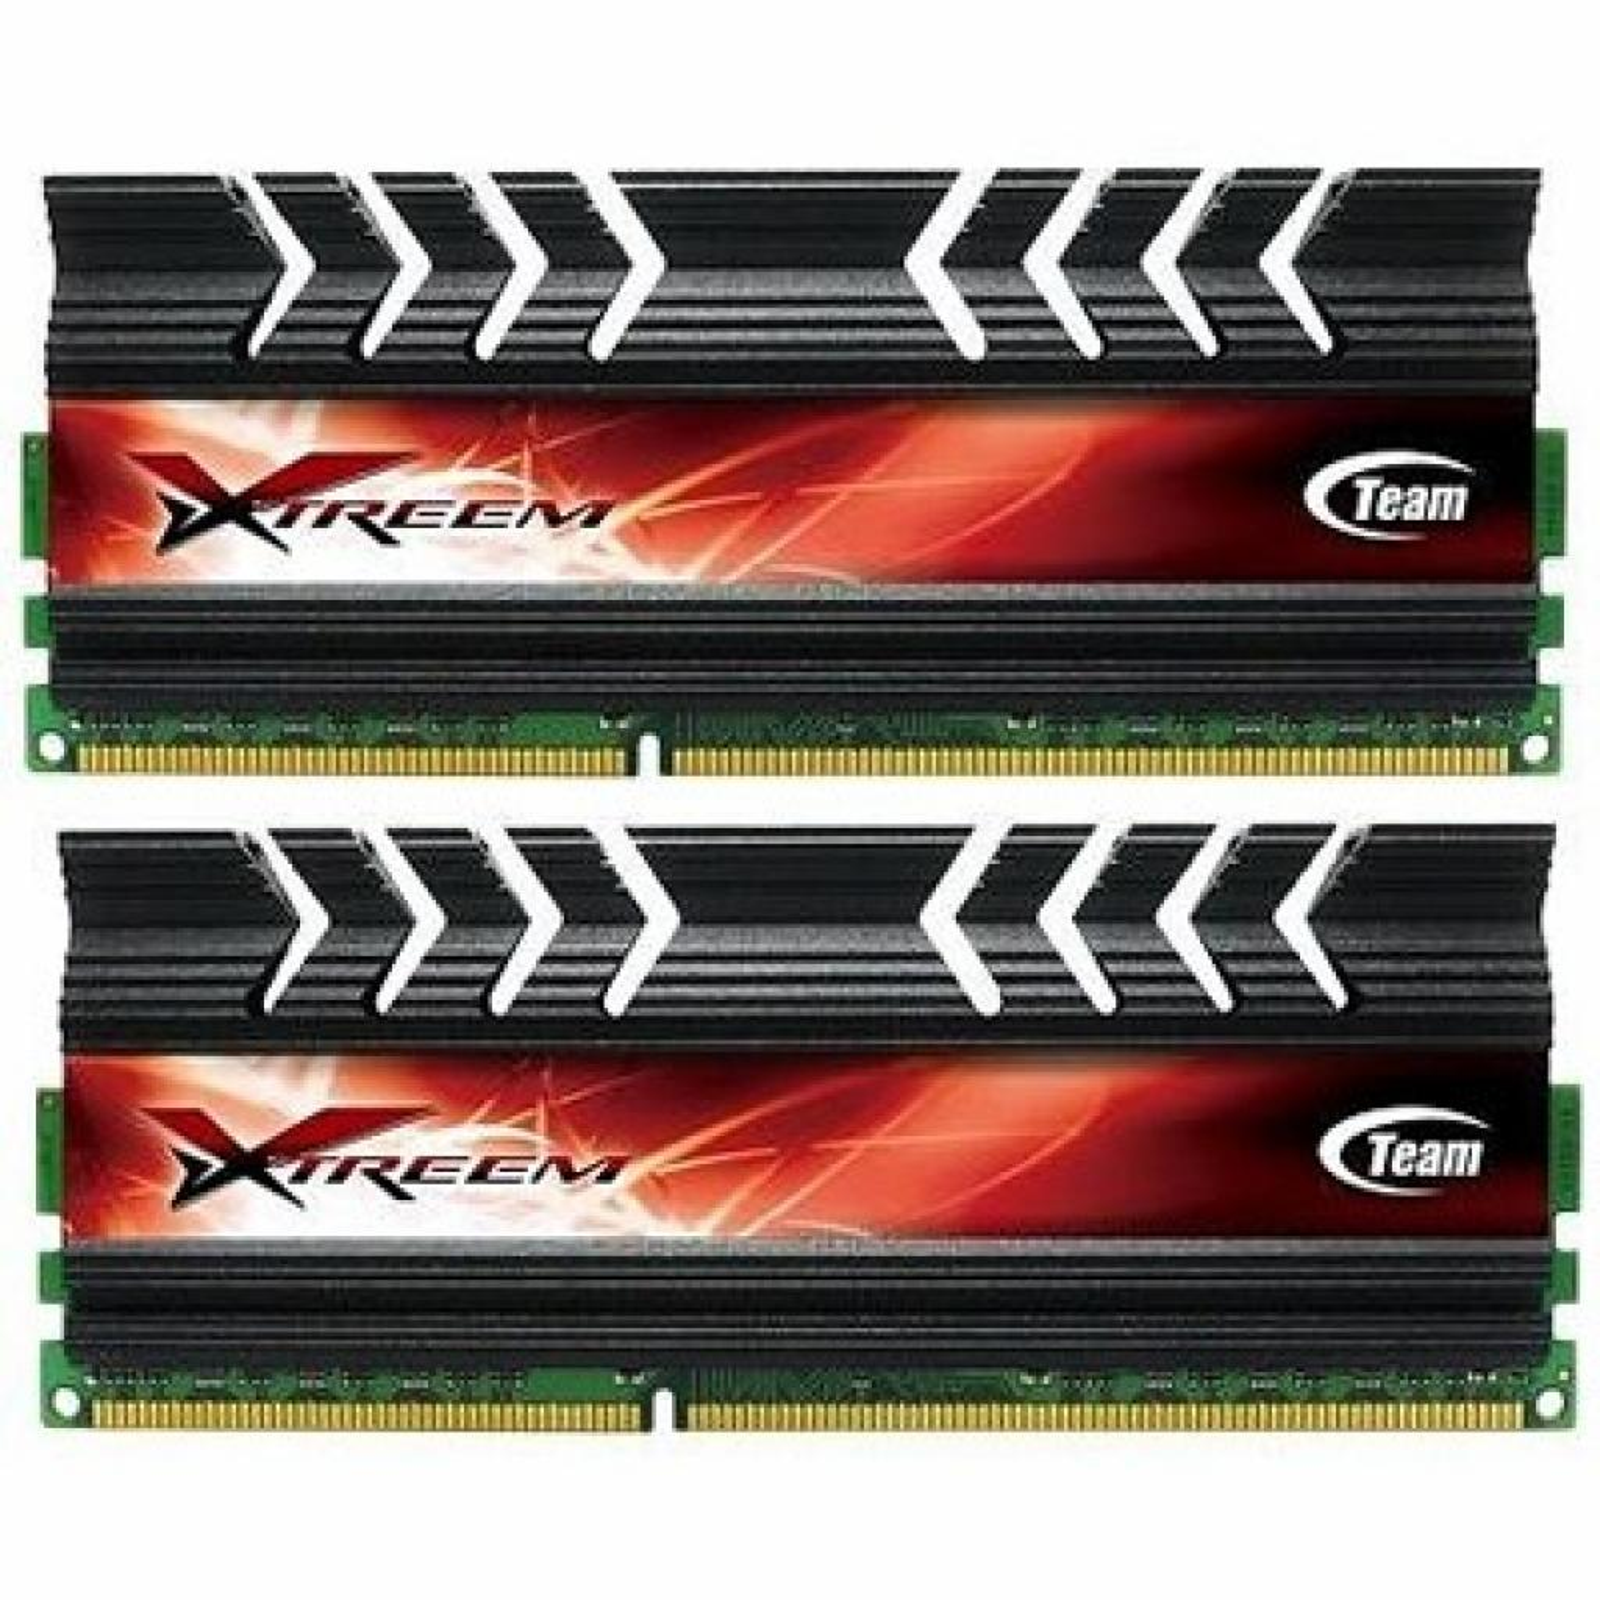 Модуль памяти для компьютера DDR3 8GB (2x4GB) 2400 MHz Team (TXD38G2400HC11DC01)